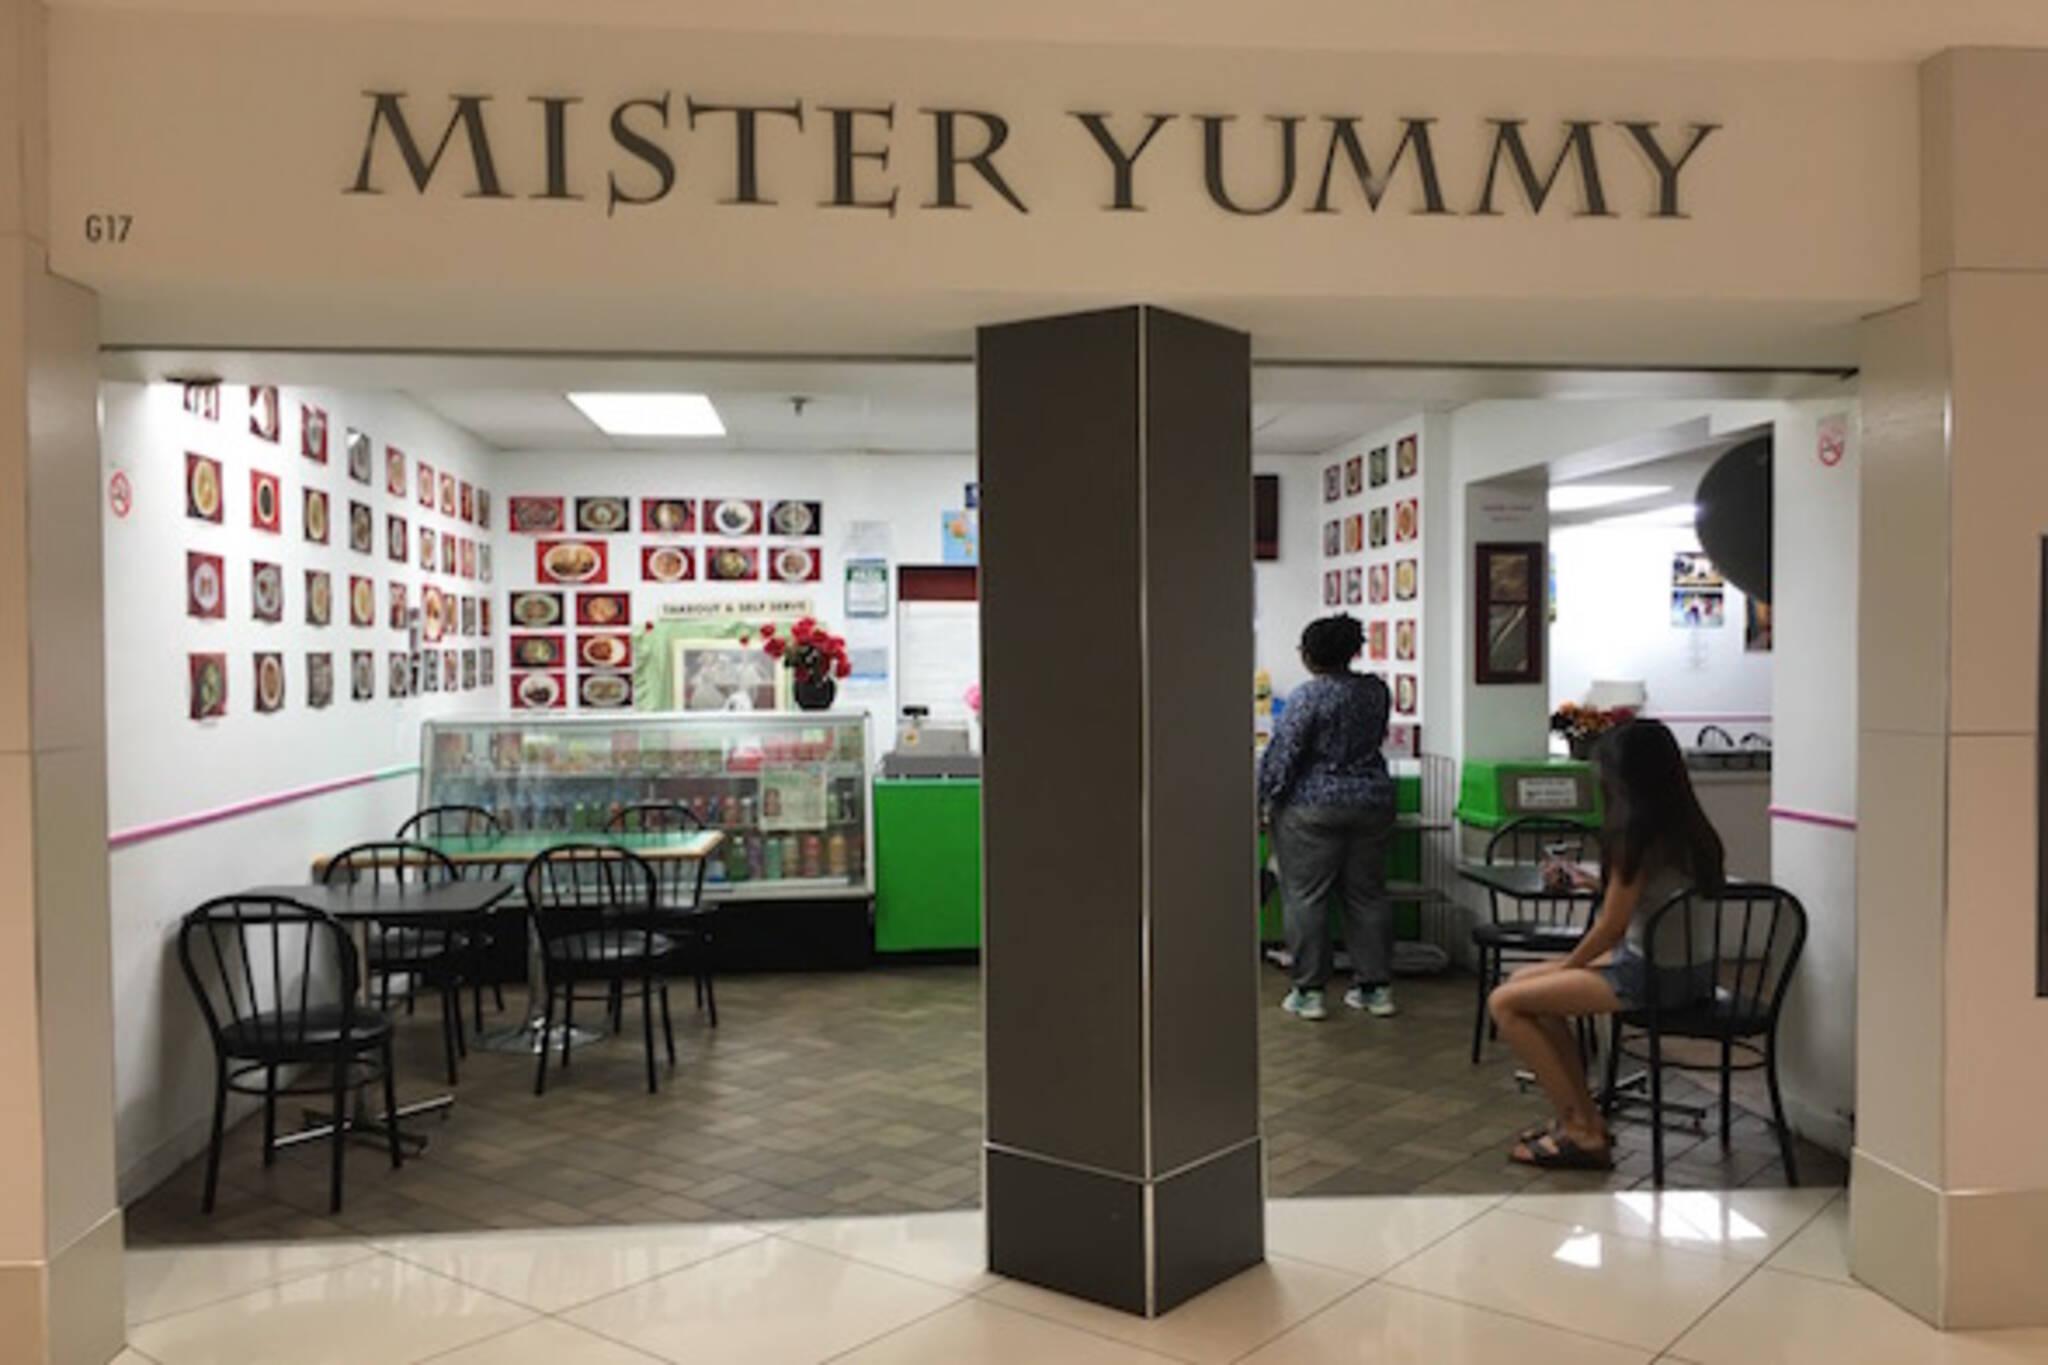 Mister Yummy